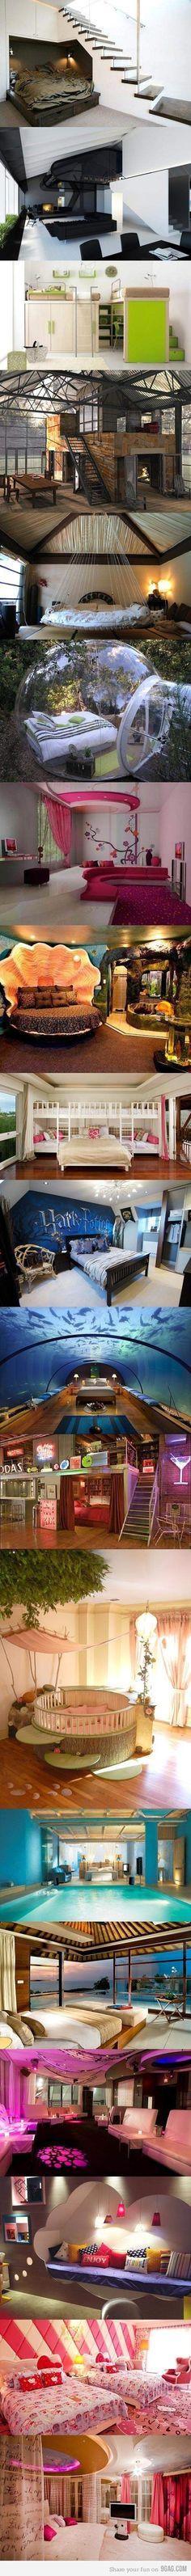 cool Bedrooms